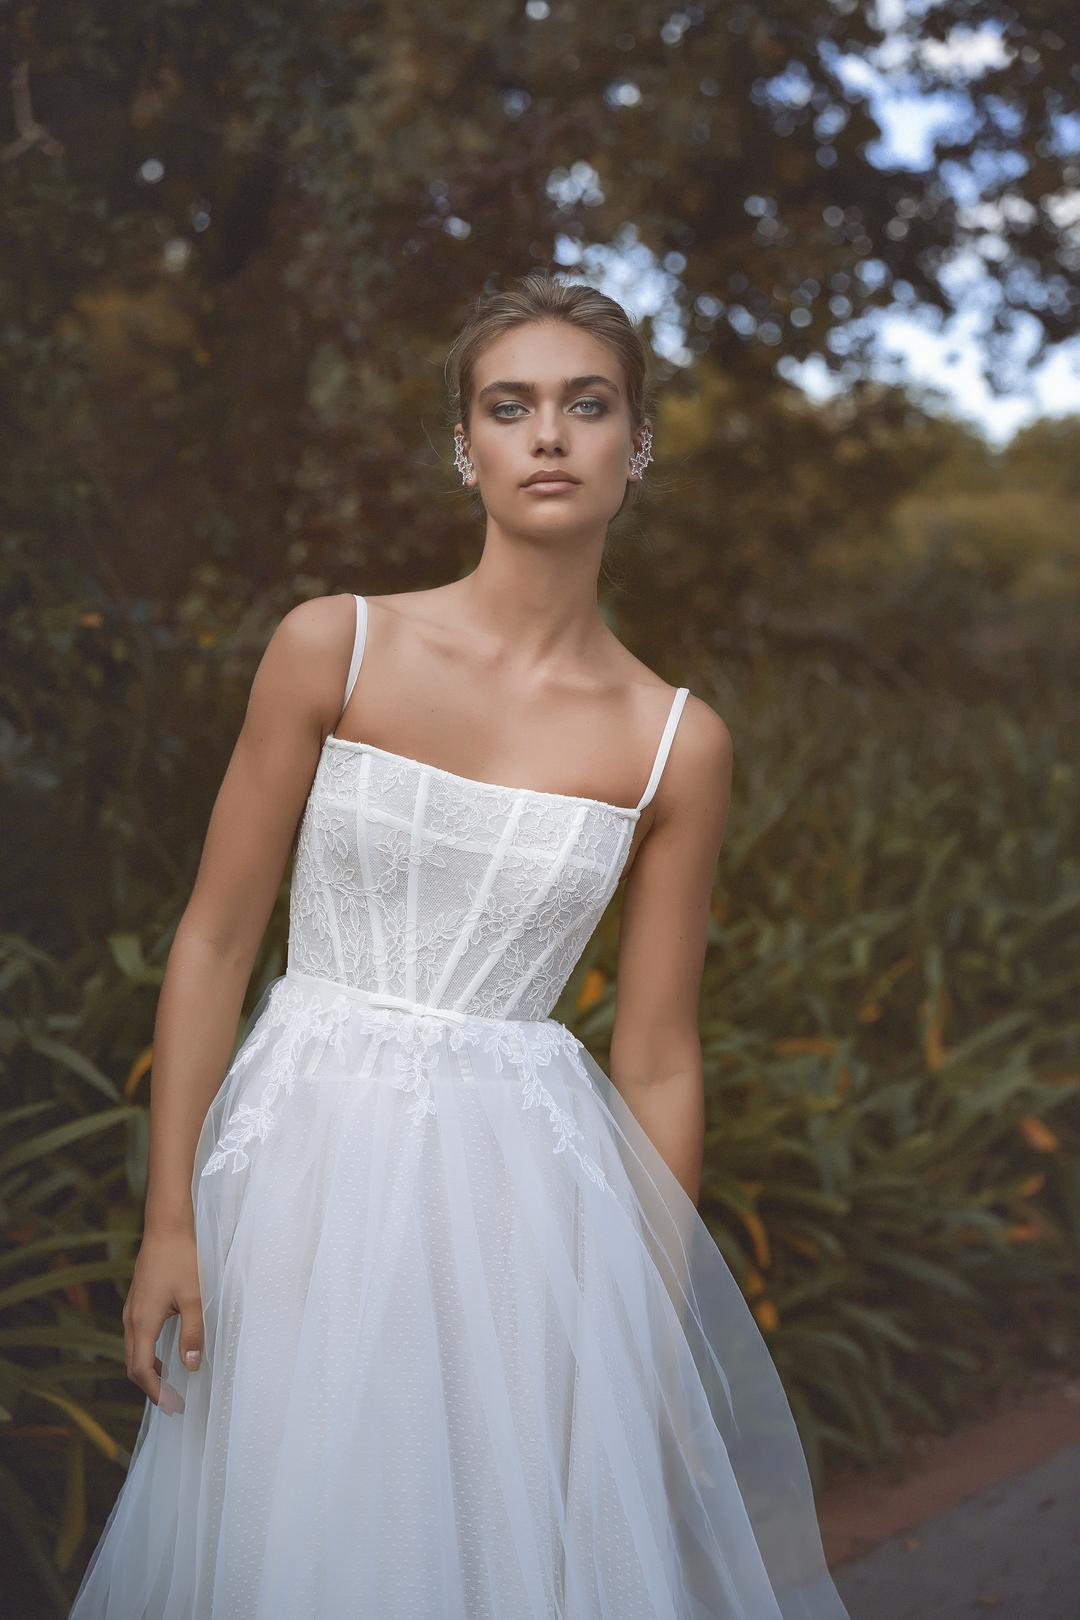 caterina dress photo